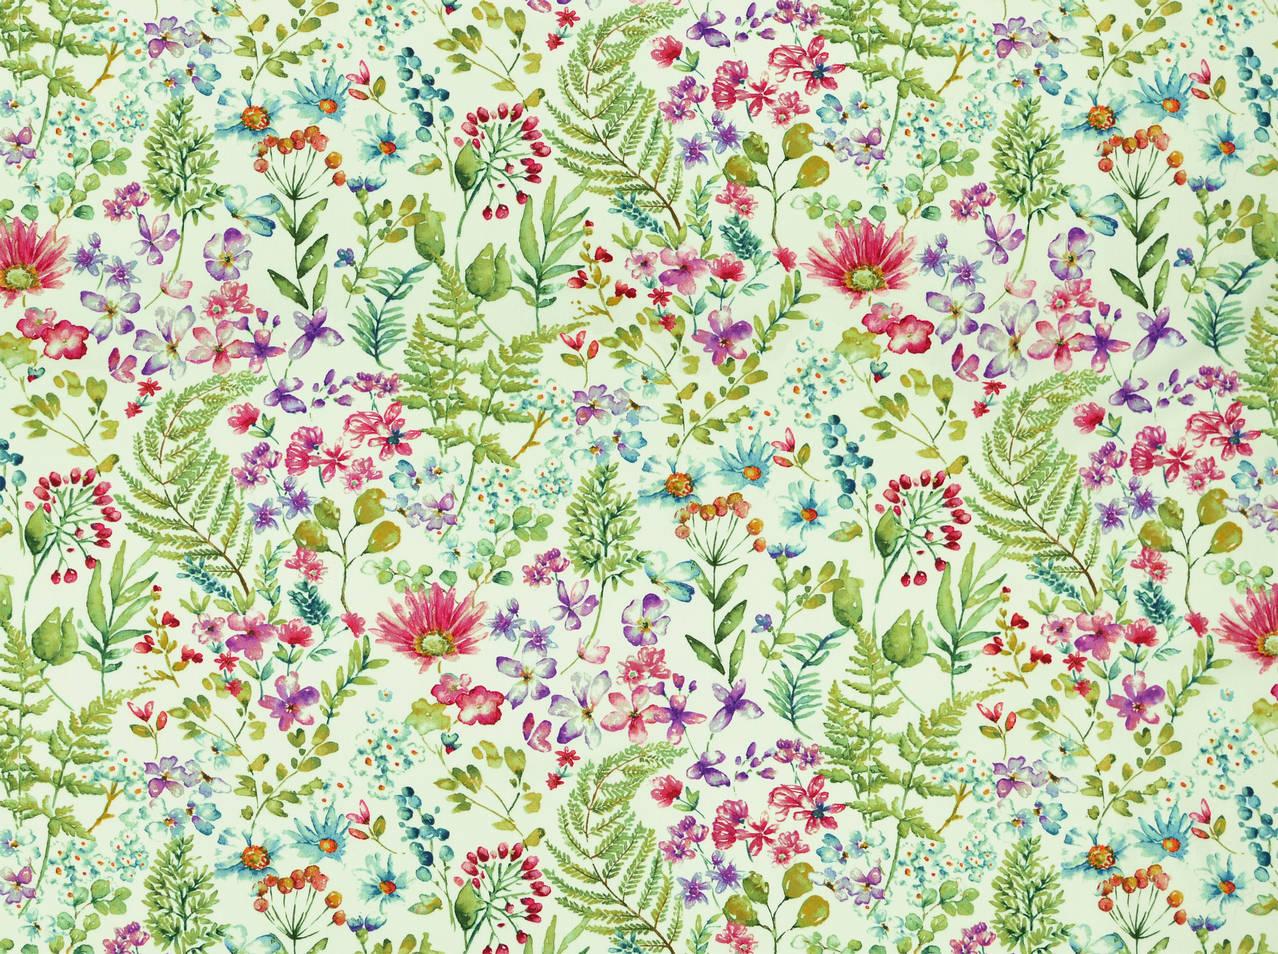 Covington Prints Botanica